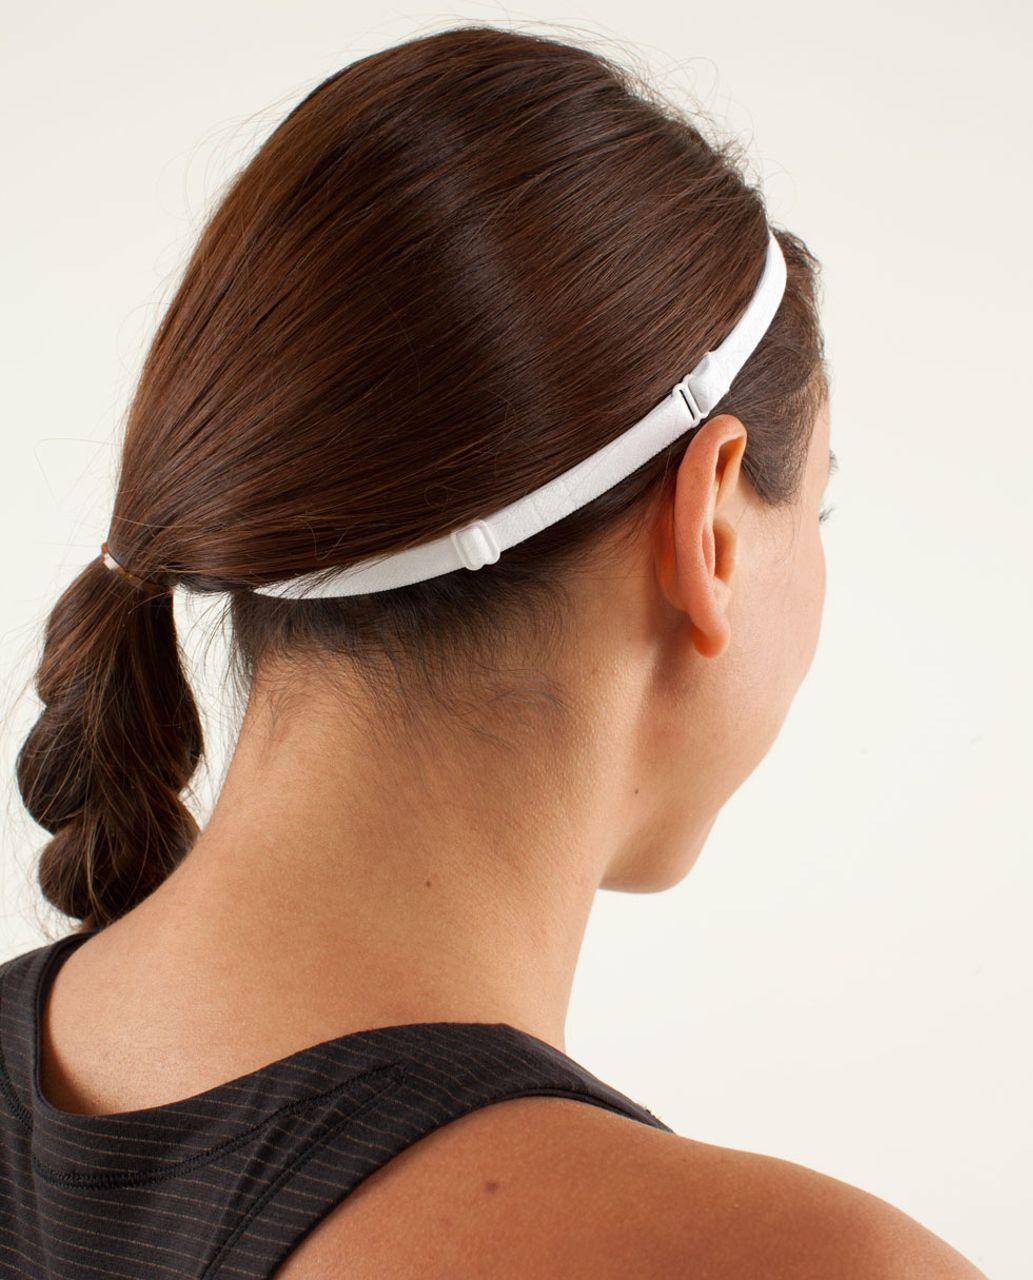 Lululemon Strappy Headband - White